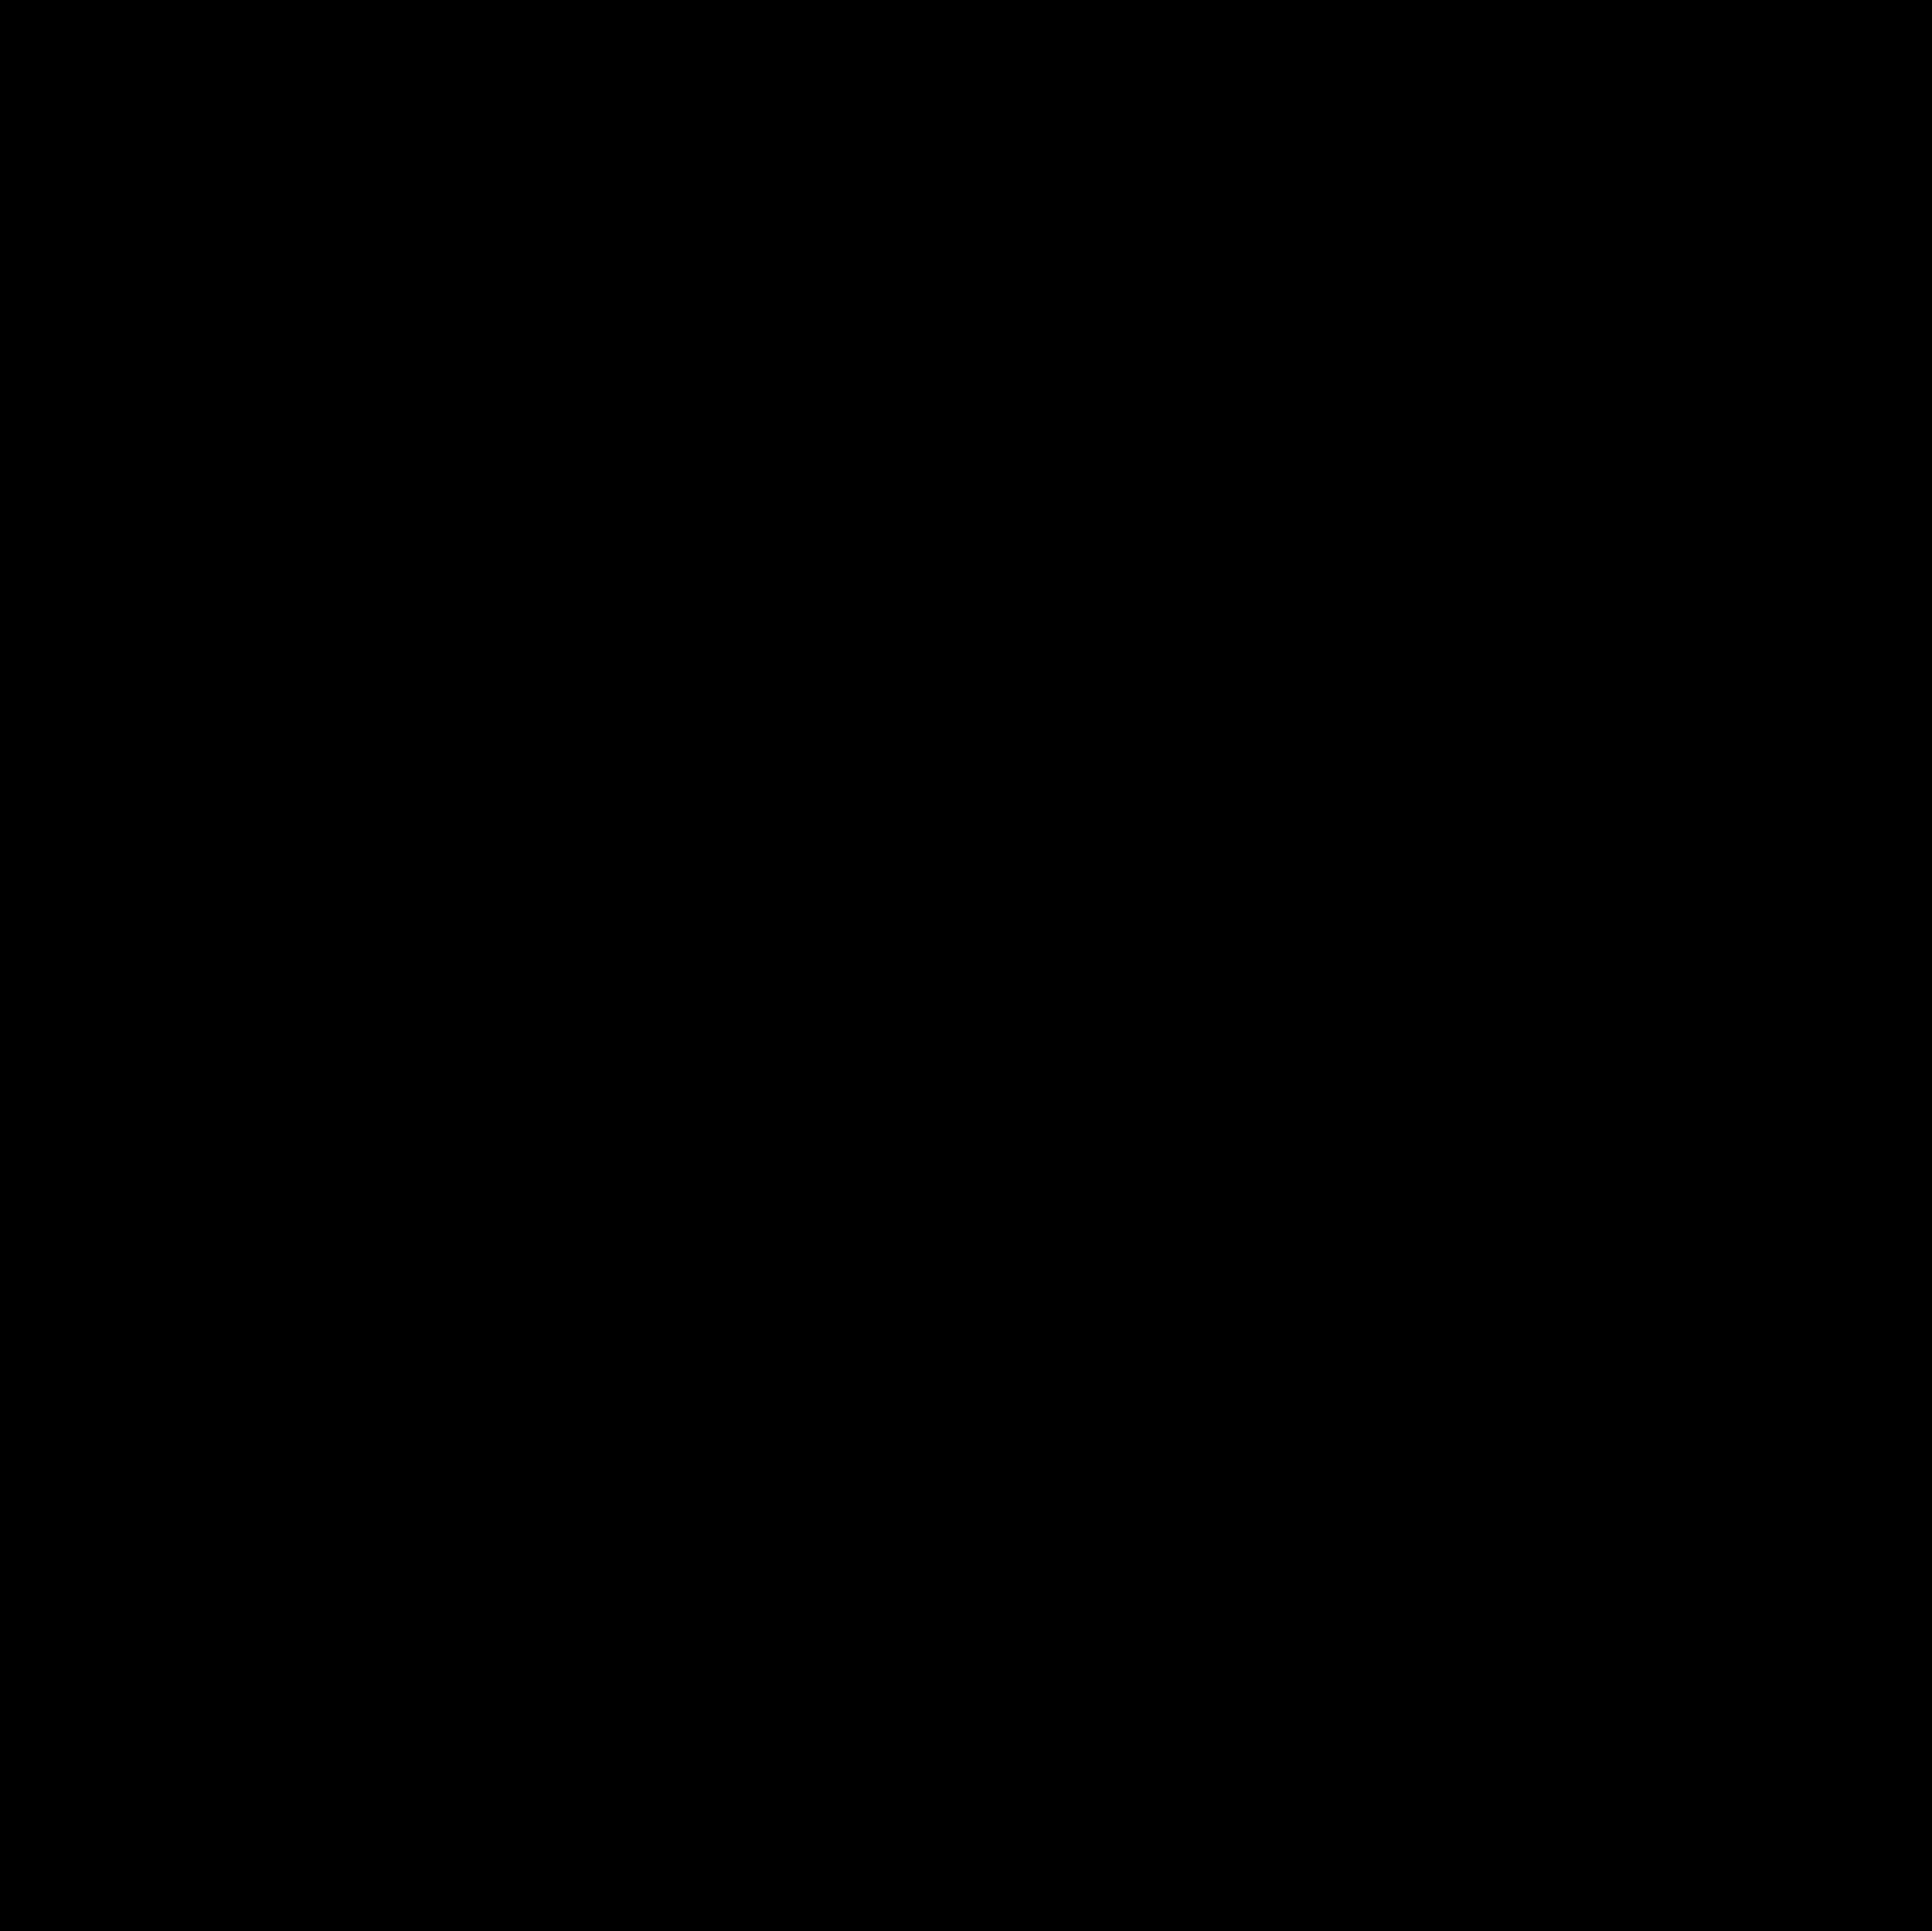 Attention Logo Black.png